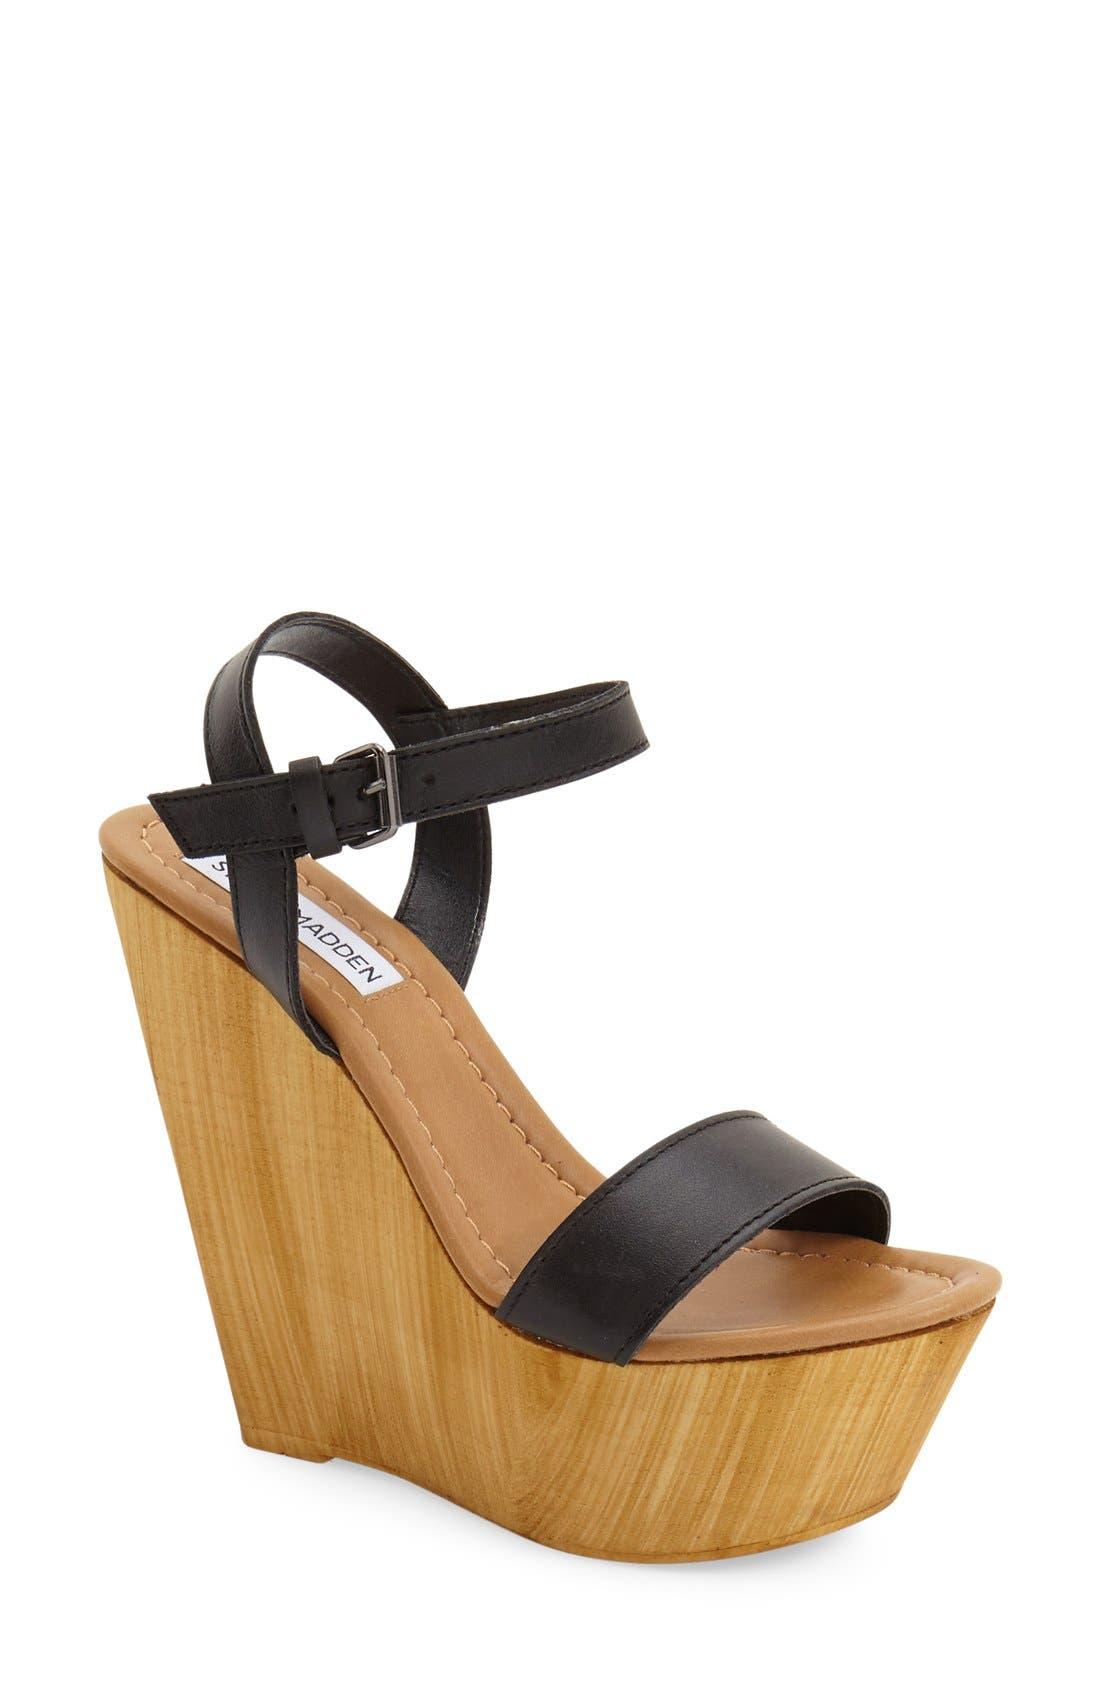 'Kalesi' Platform Wedge Sandal,                             Main thumbnail 1, color,                             001